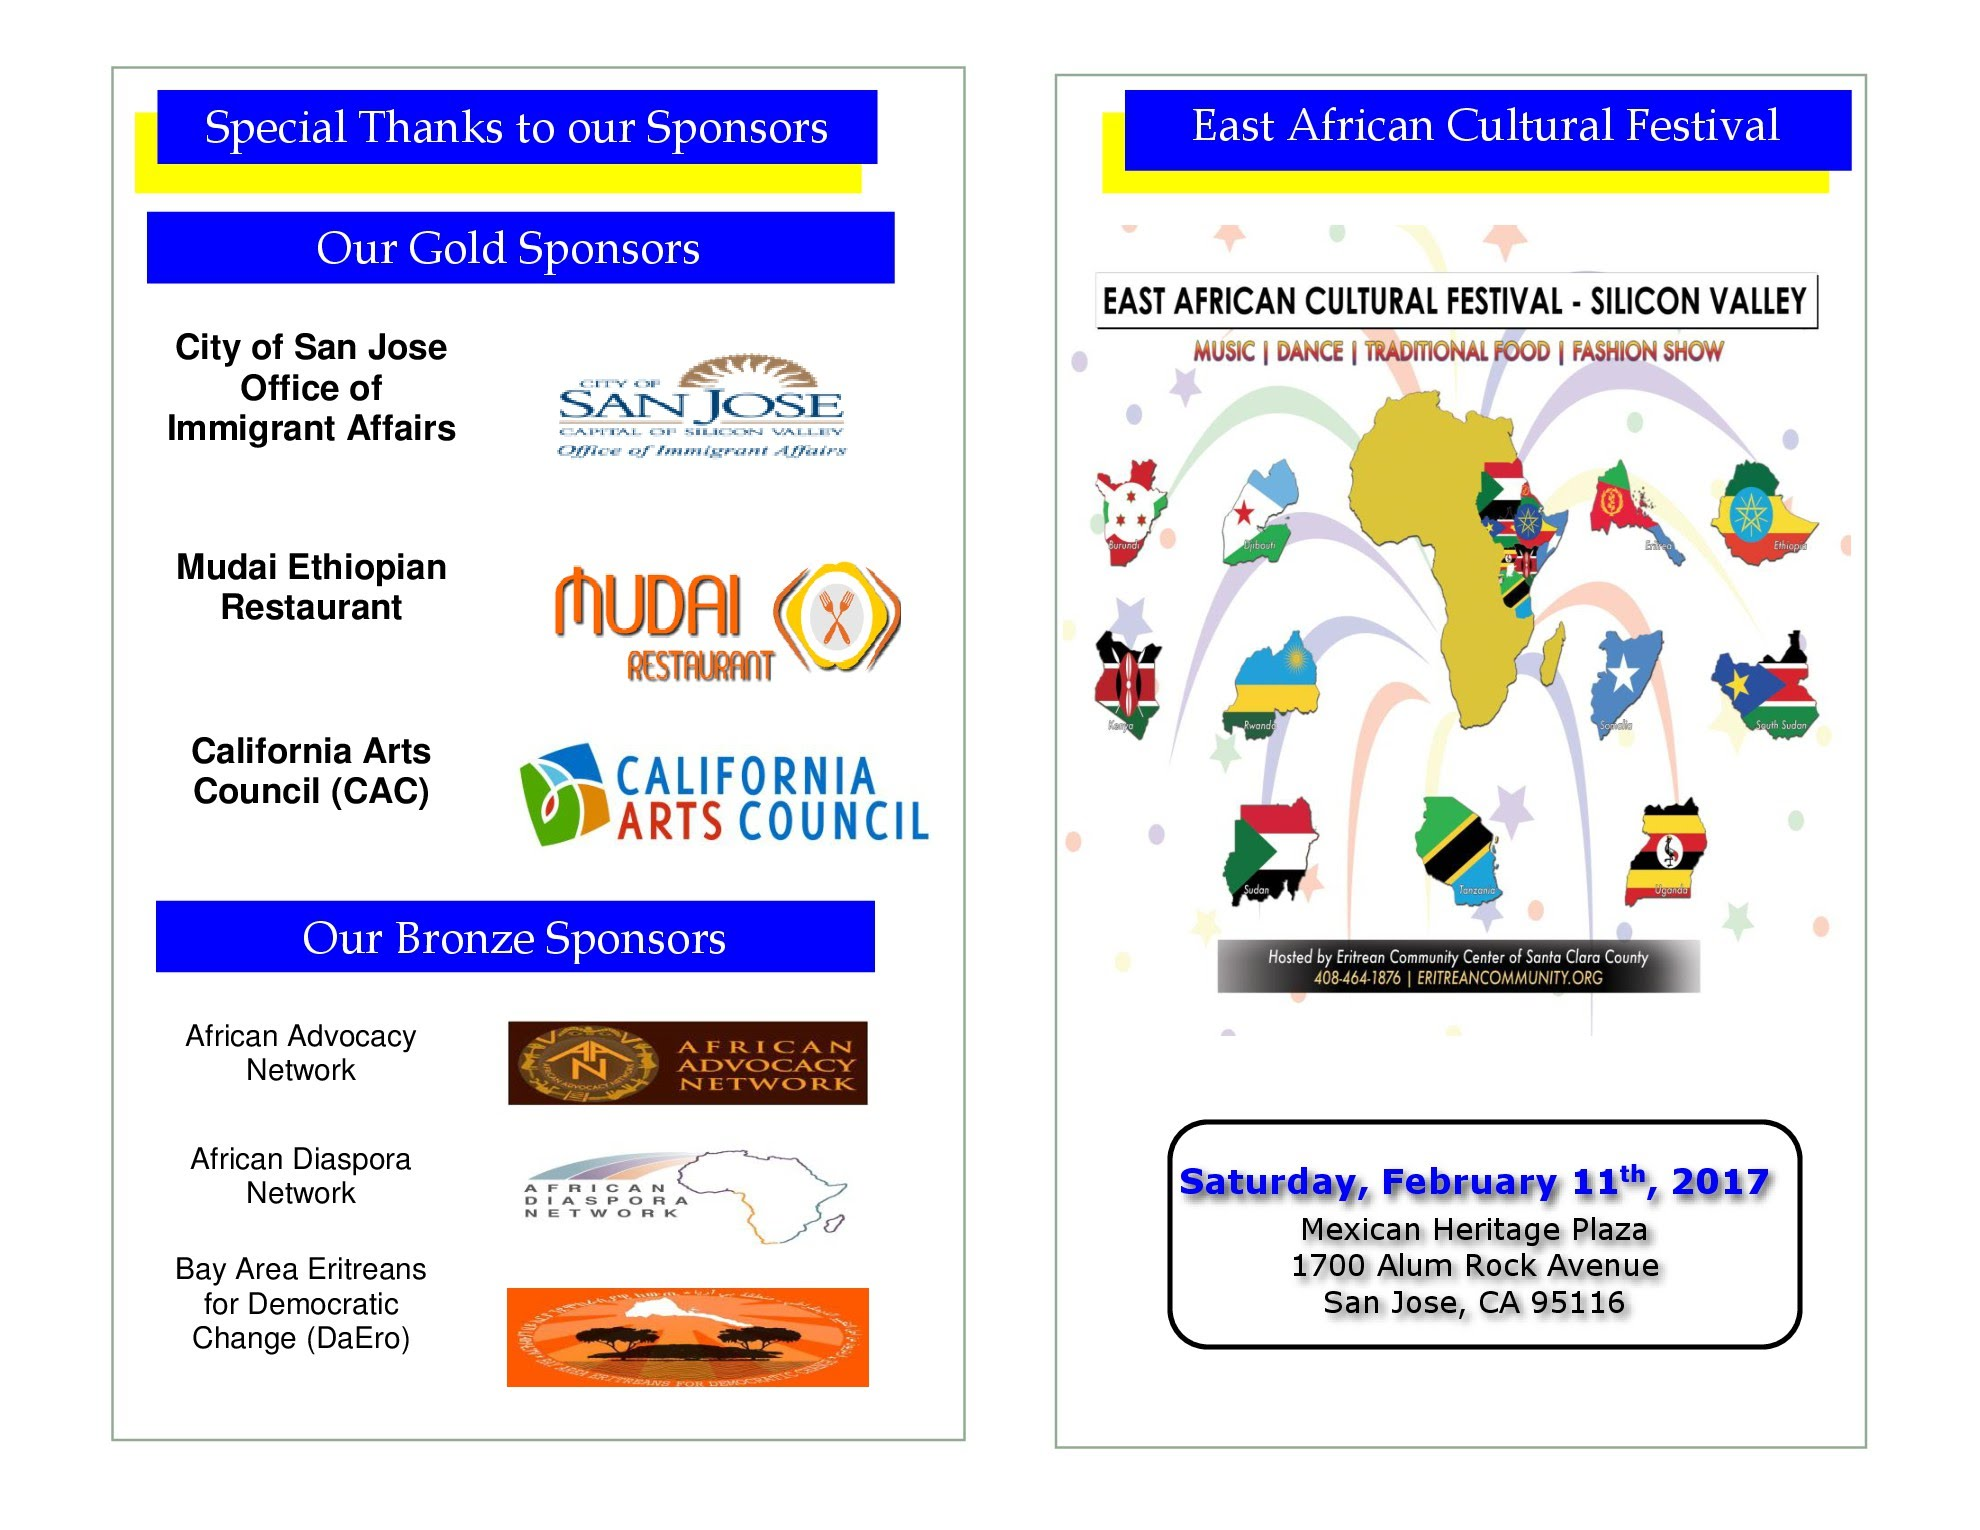 https://sites.google.com/a/eritreancommunity.org/eritrean-community/home/00001.jpg?attredirects=0